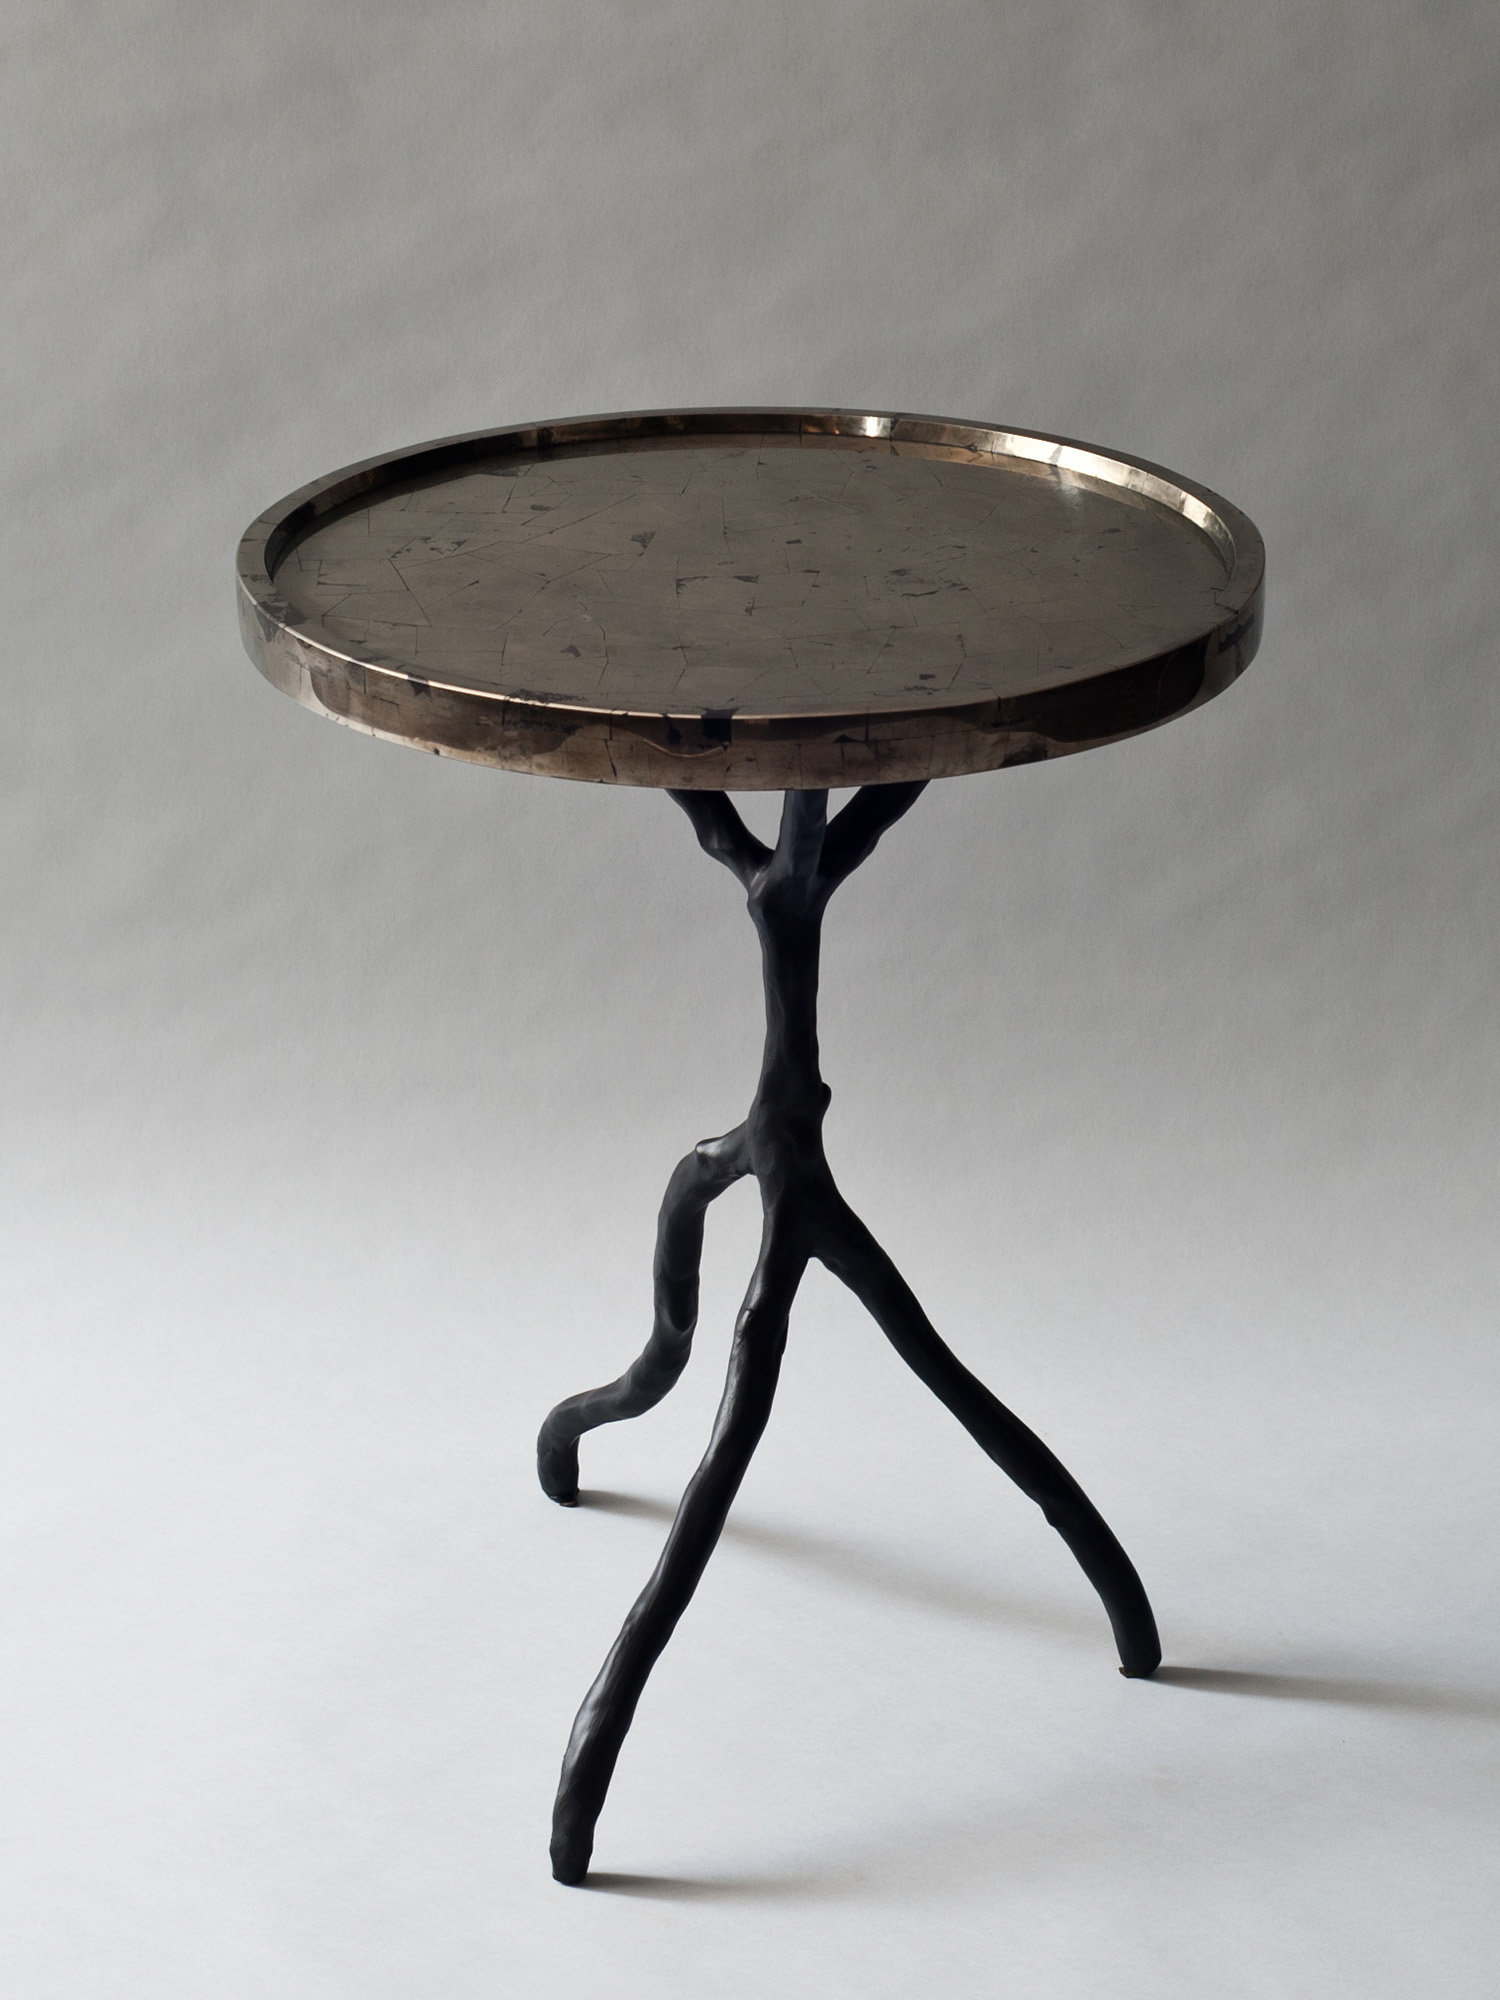 Demuro Das Demuro Das Solstice Side Table